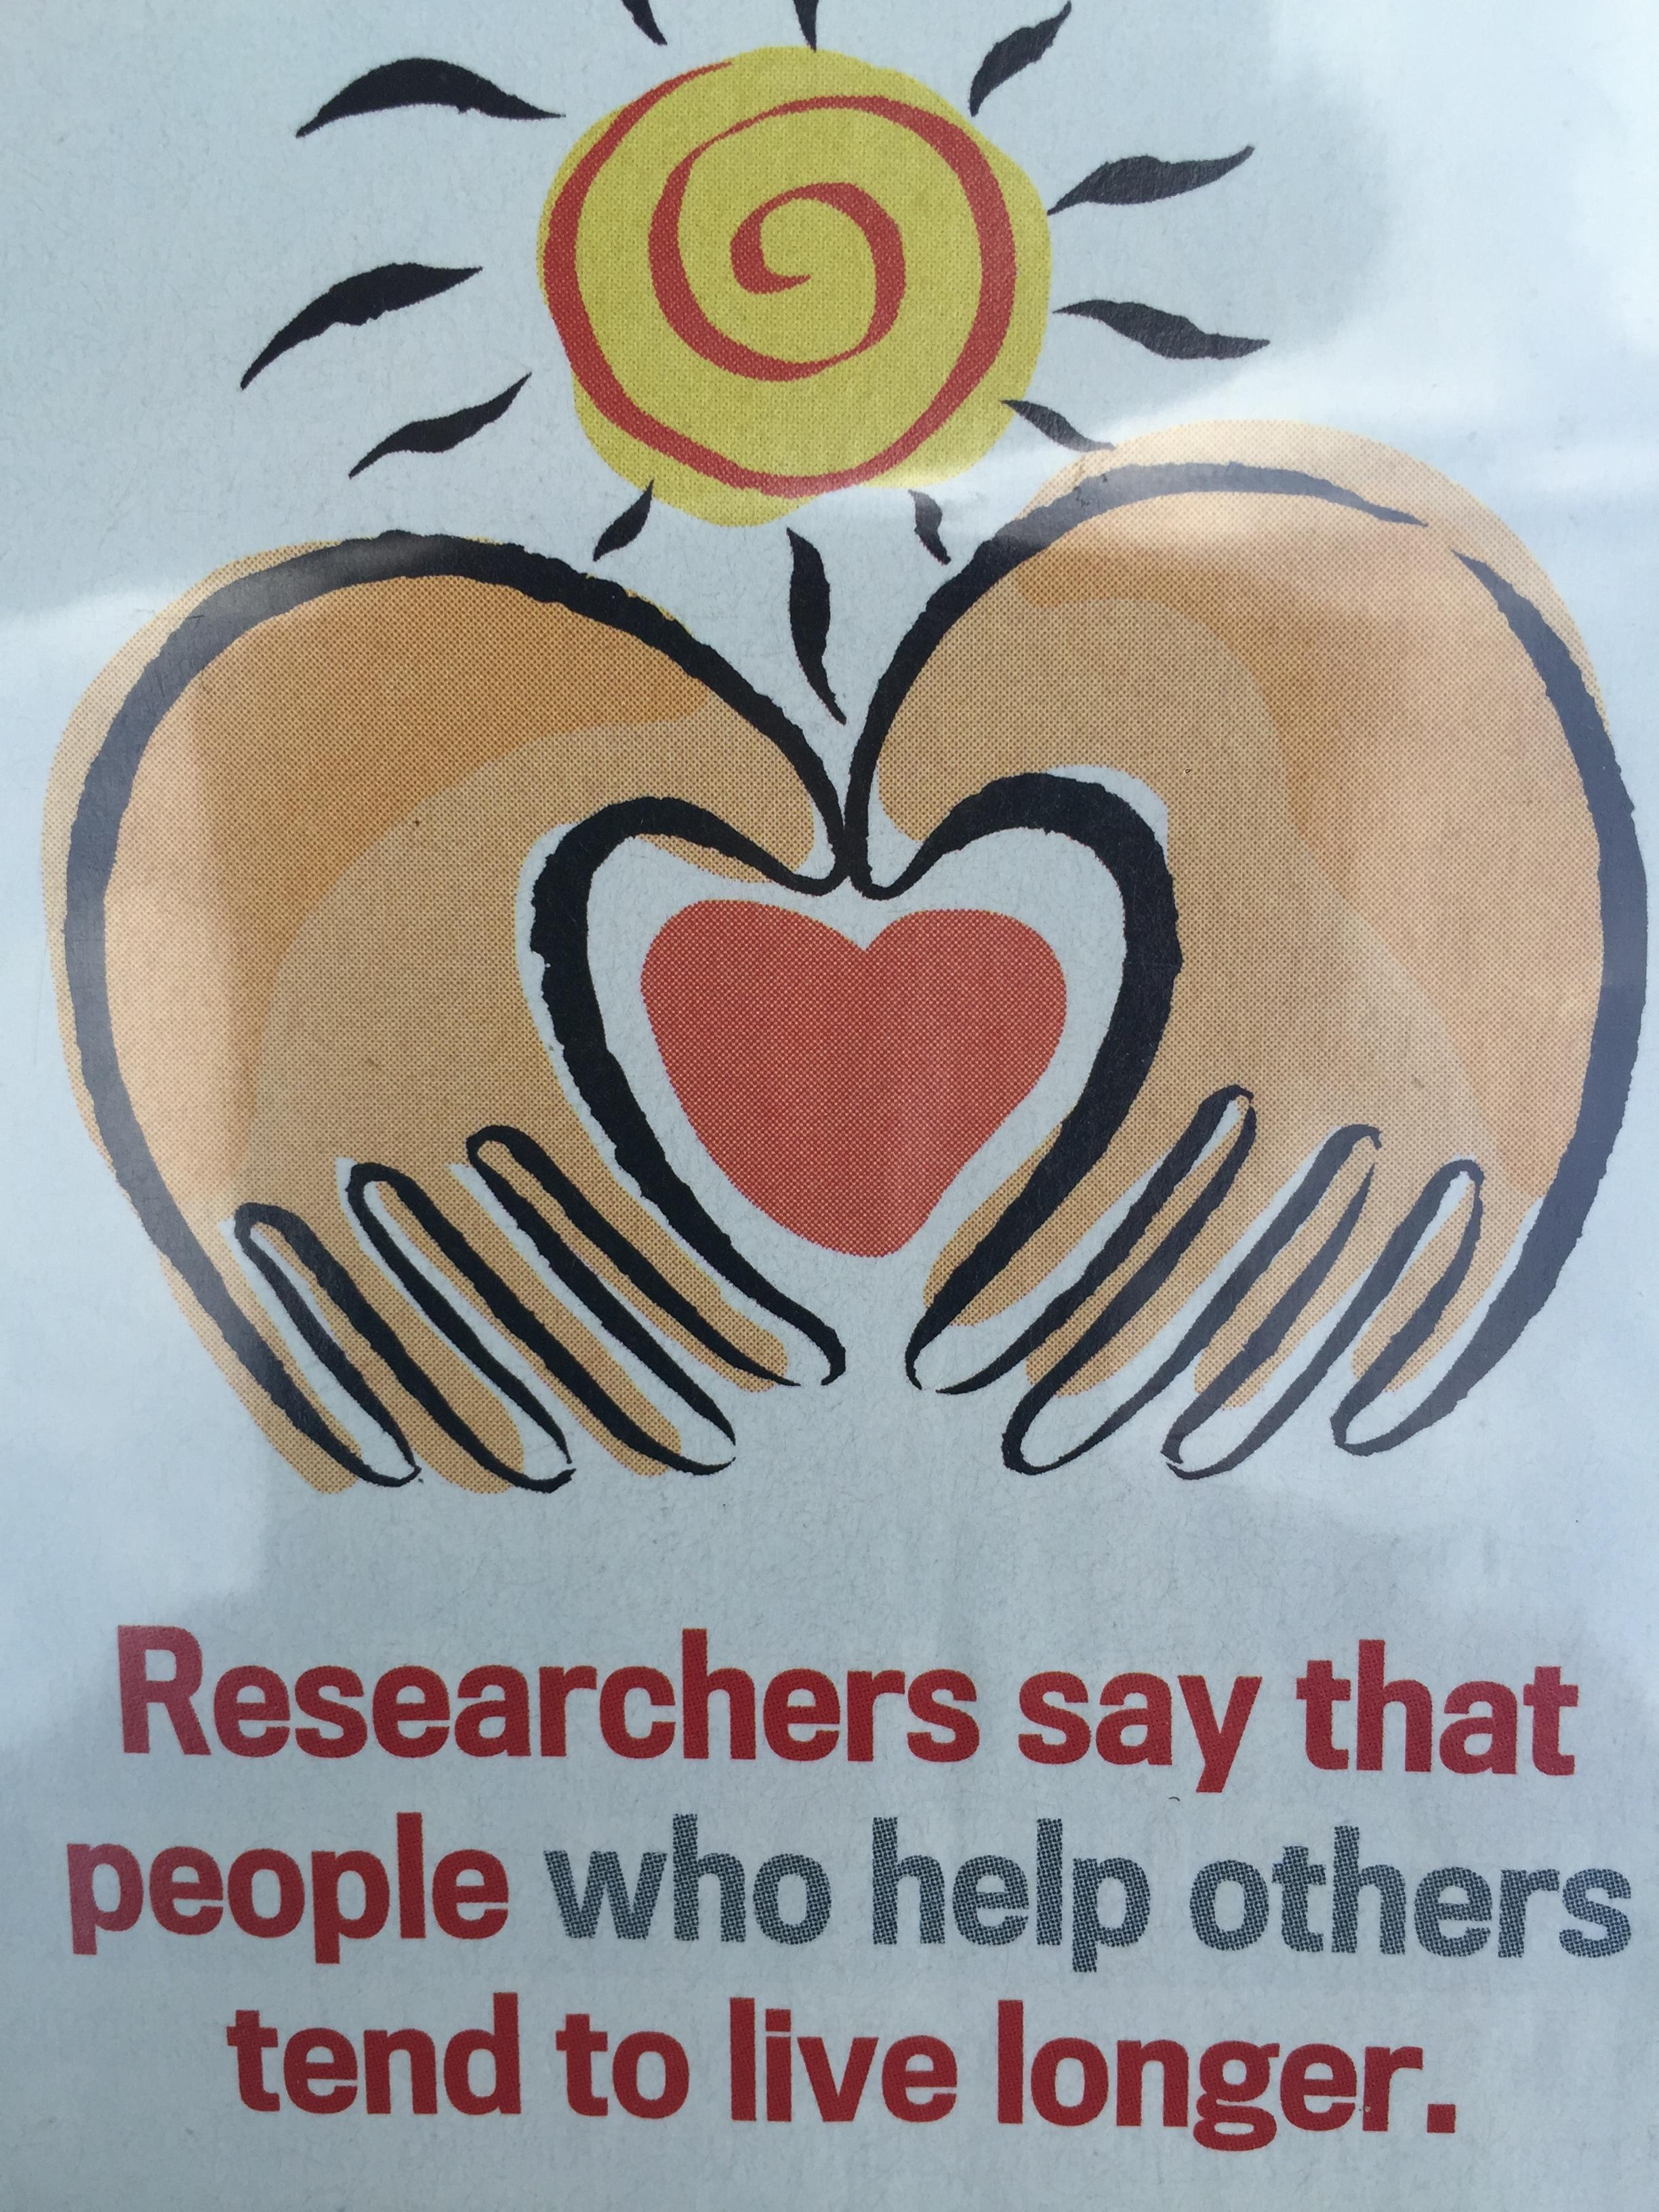 5 Reasons We Should Volunteer Why Should We Do It?